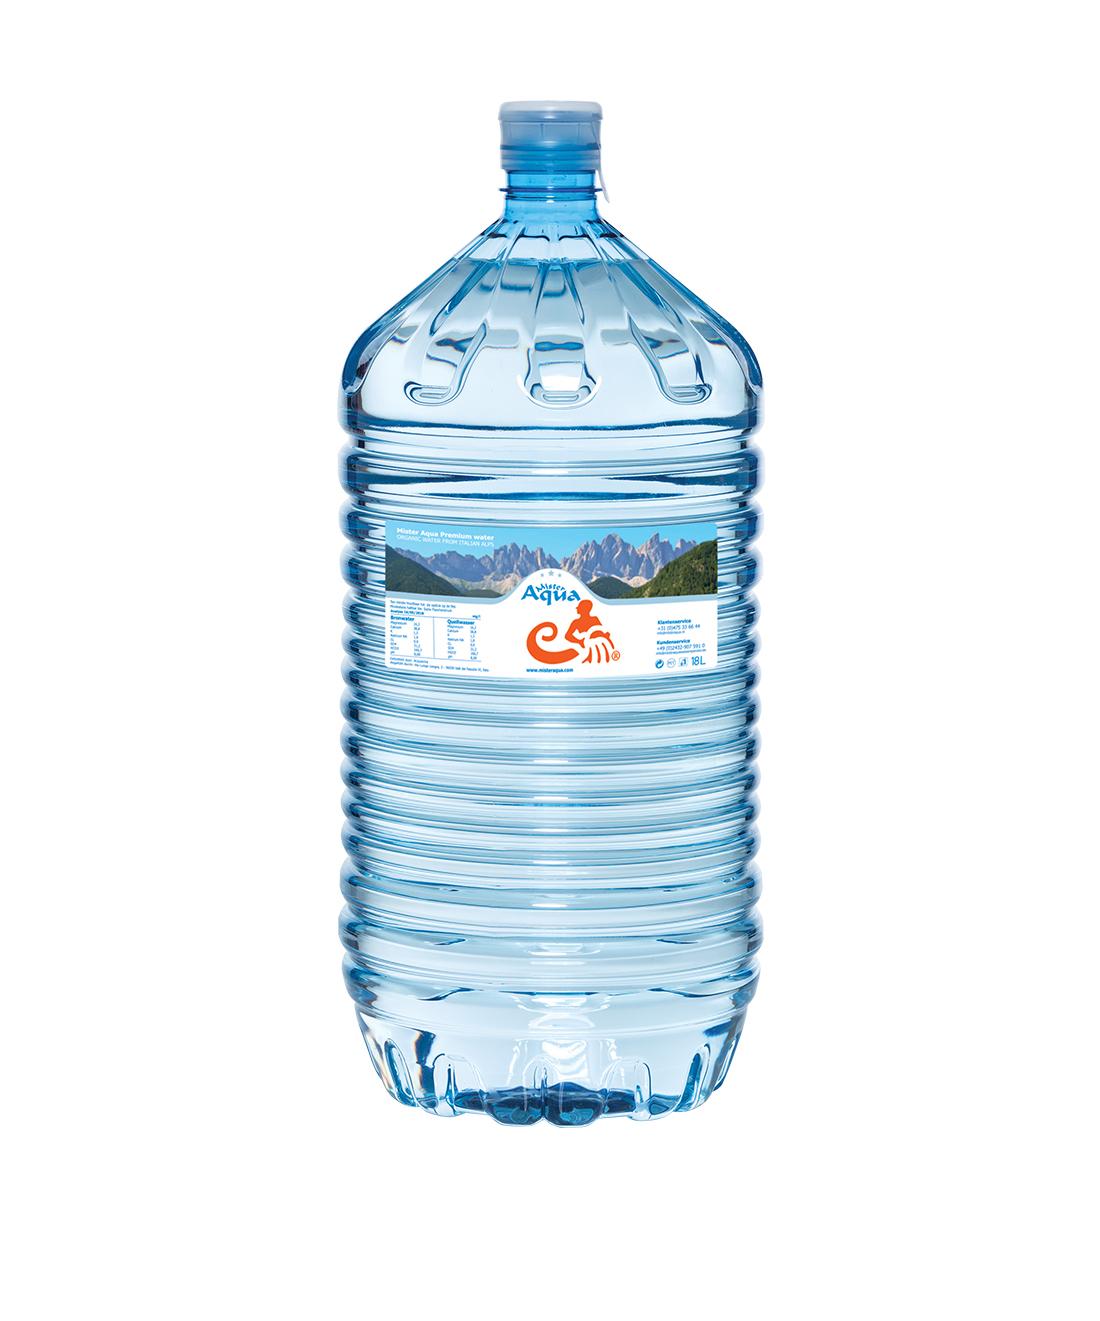 Mister-Aqua-Bronwater-18L